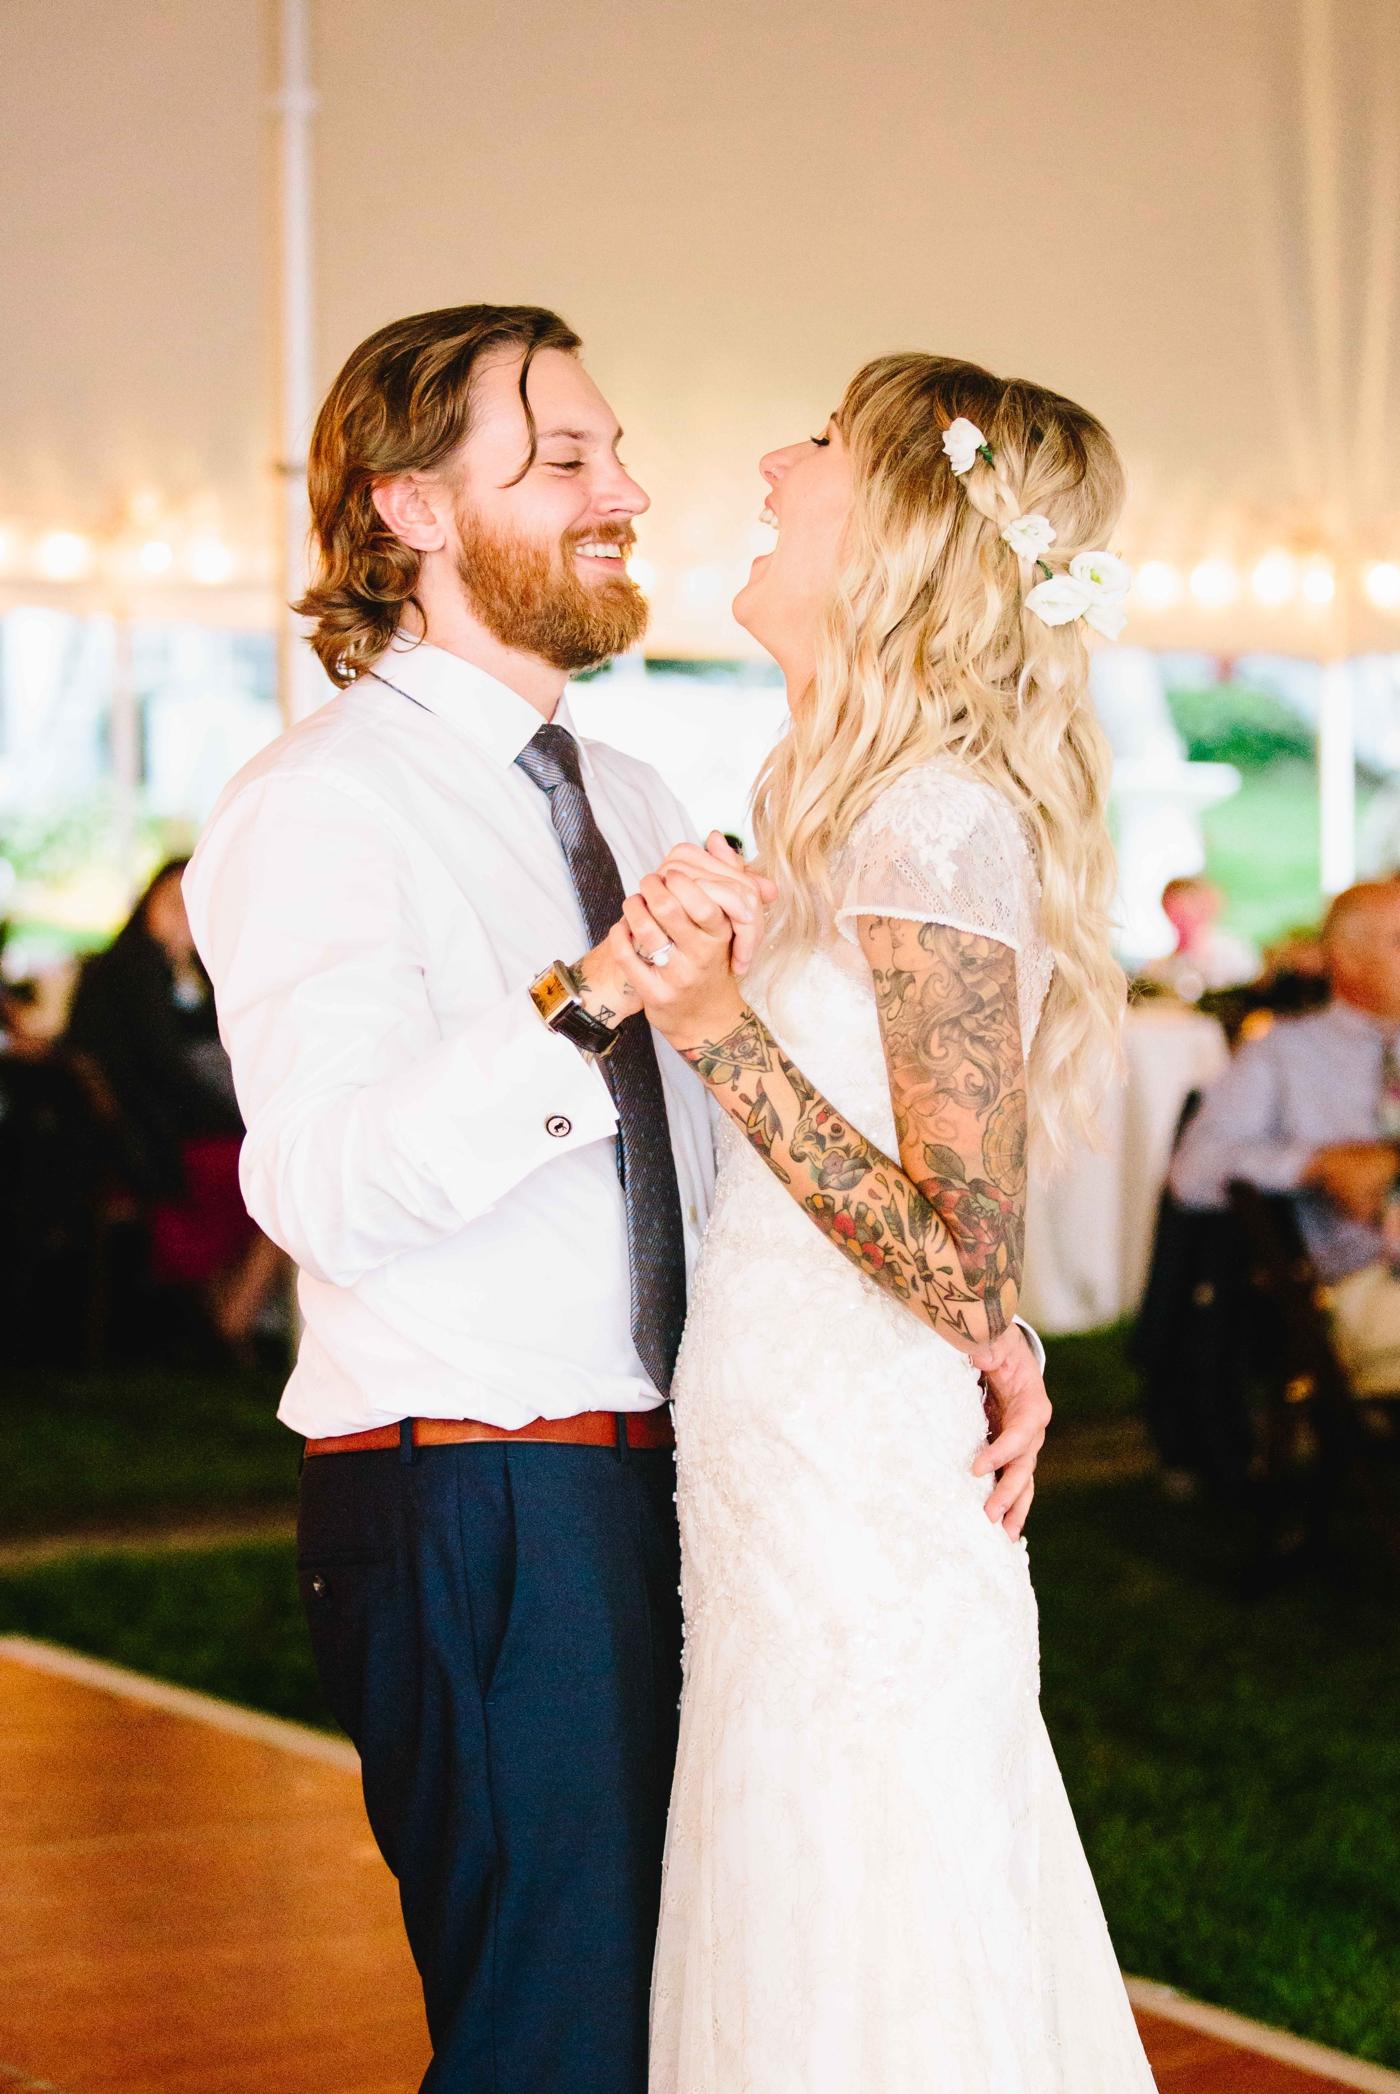 chicago-fine-art-wedding-photography-chriskelsey47